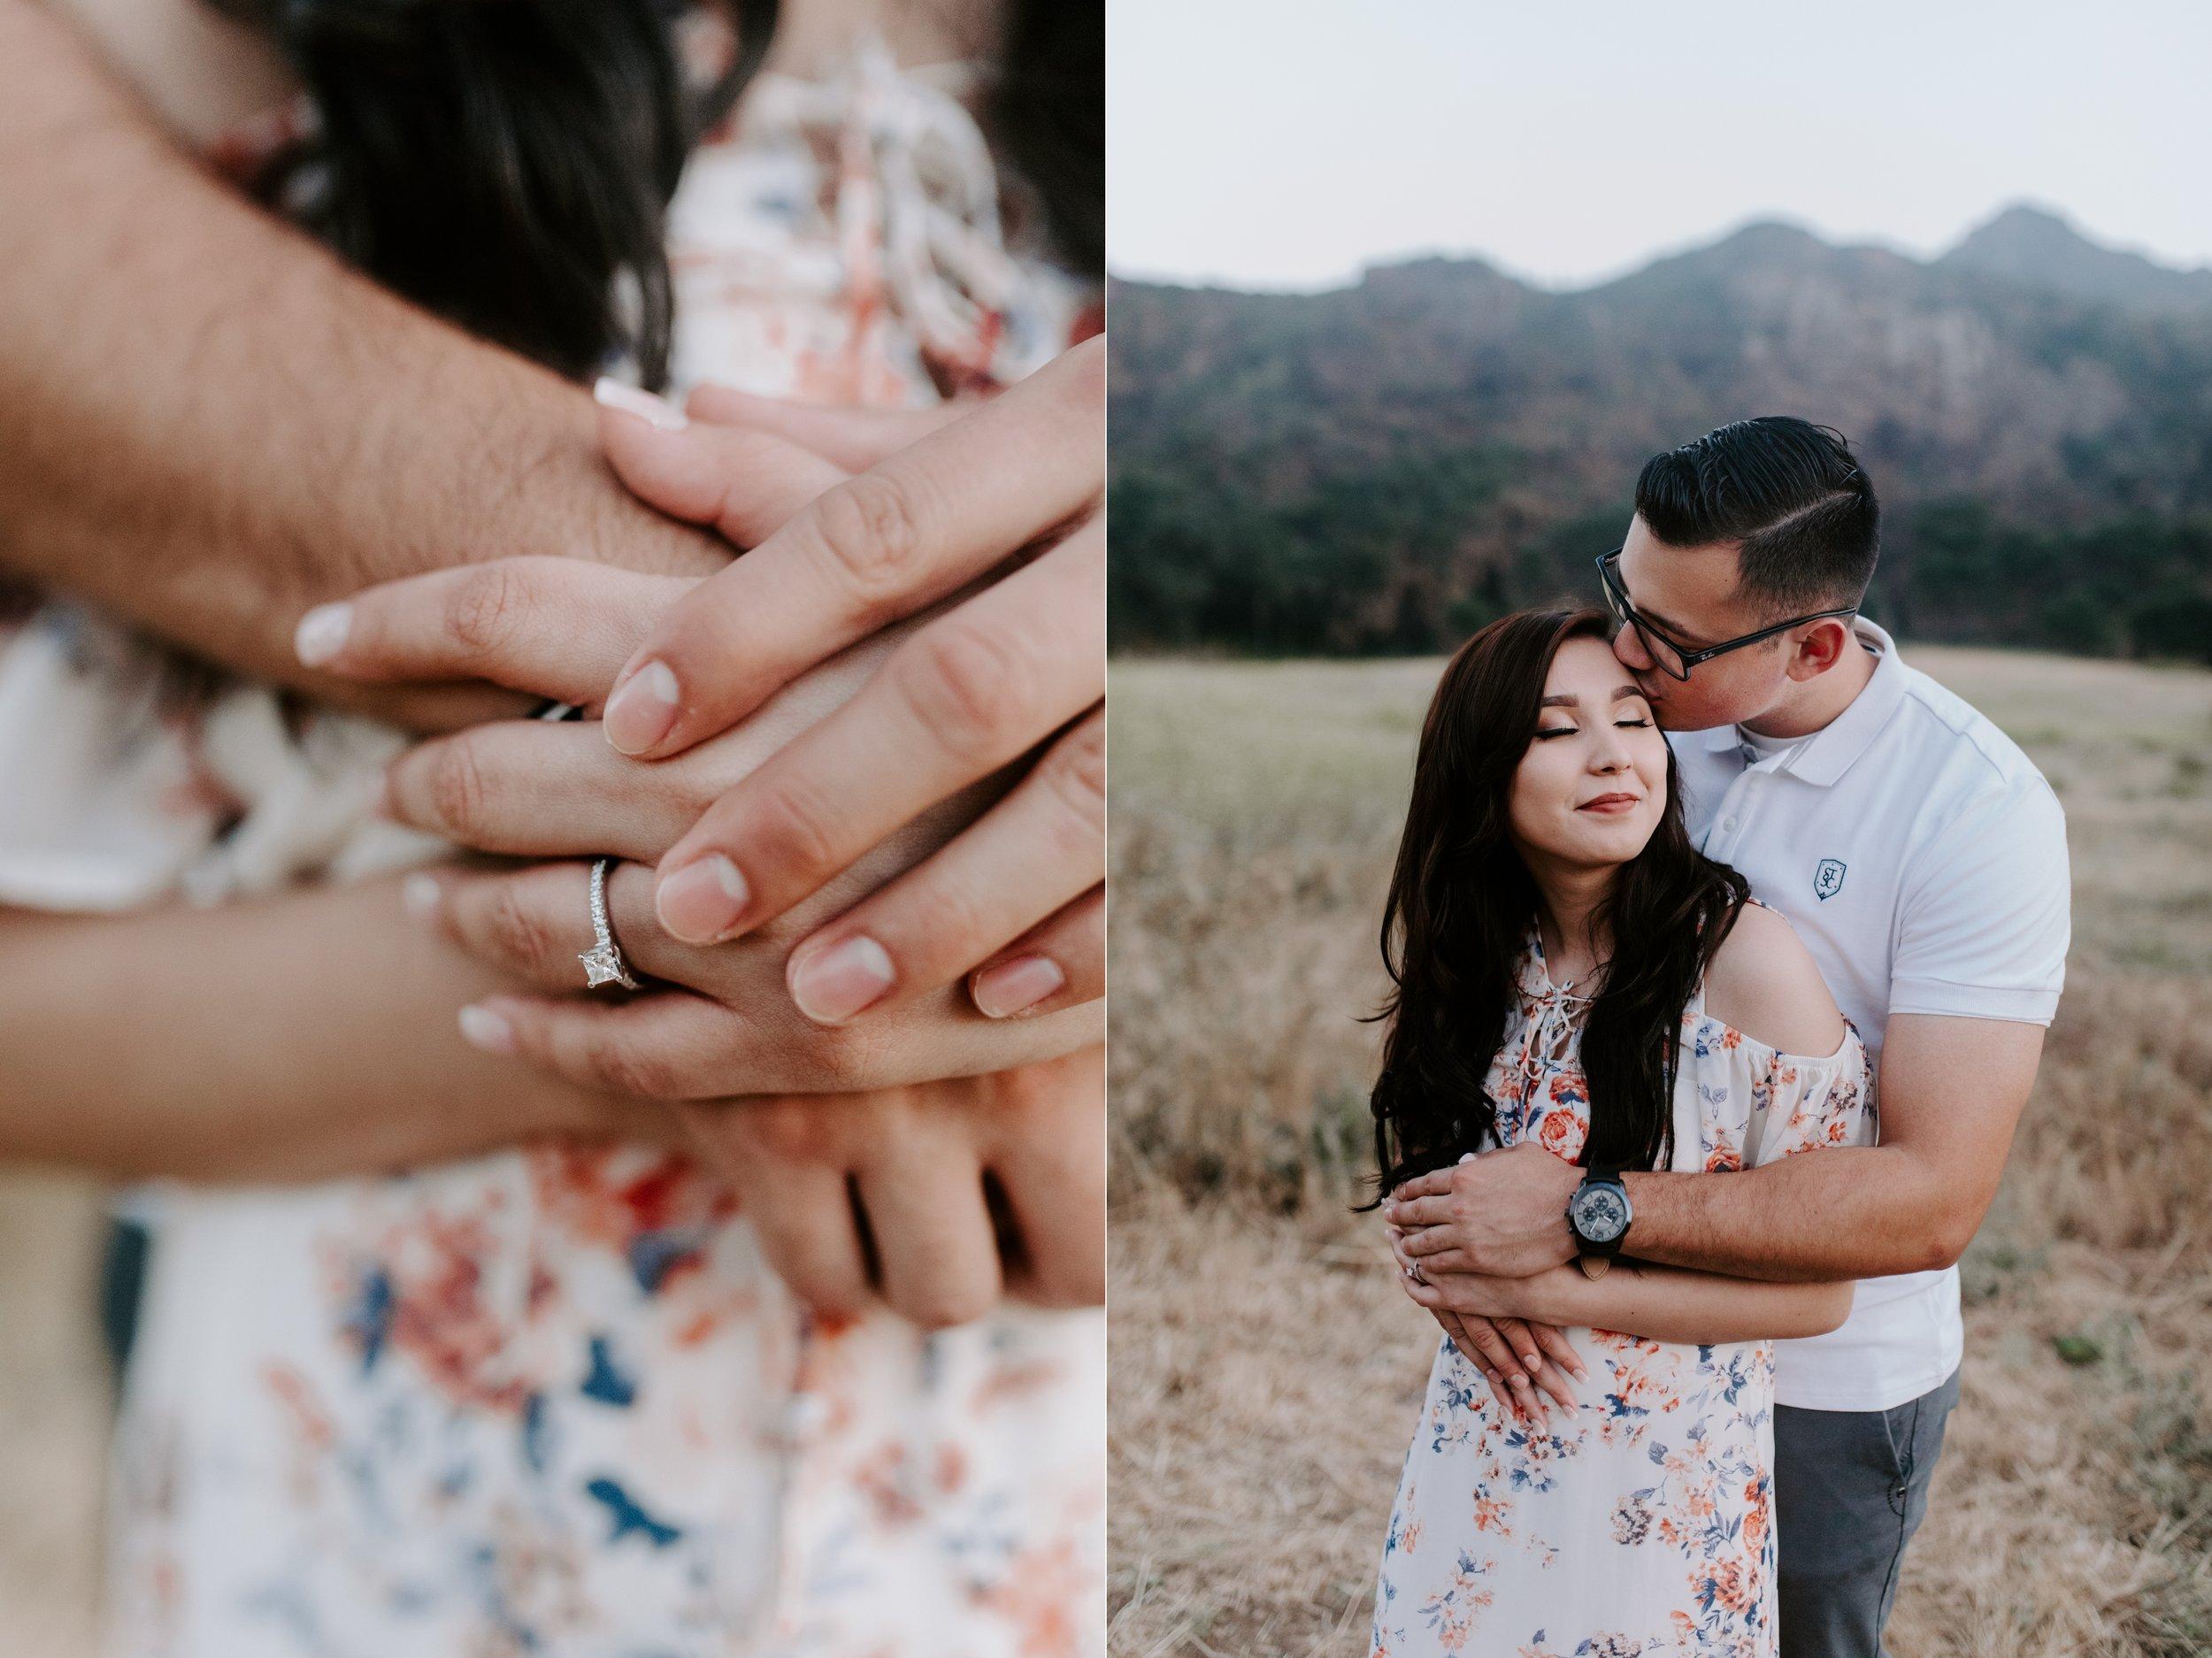 Katelyn Faye Photography | www.katelynfaye.com | Las Vegas Wedding Photographer | Malibu Creek State Park Engagements | J&N (30 of 33)-side.jpg